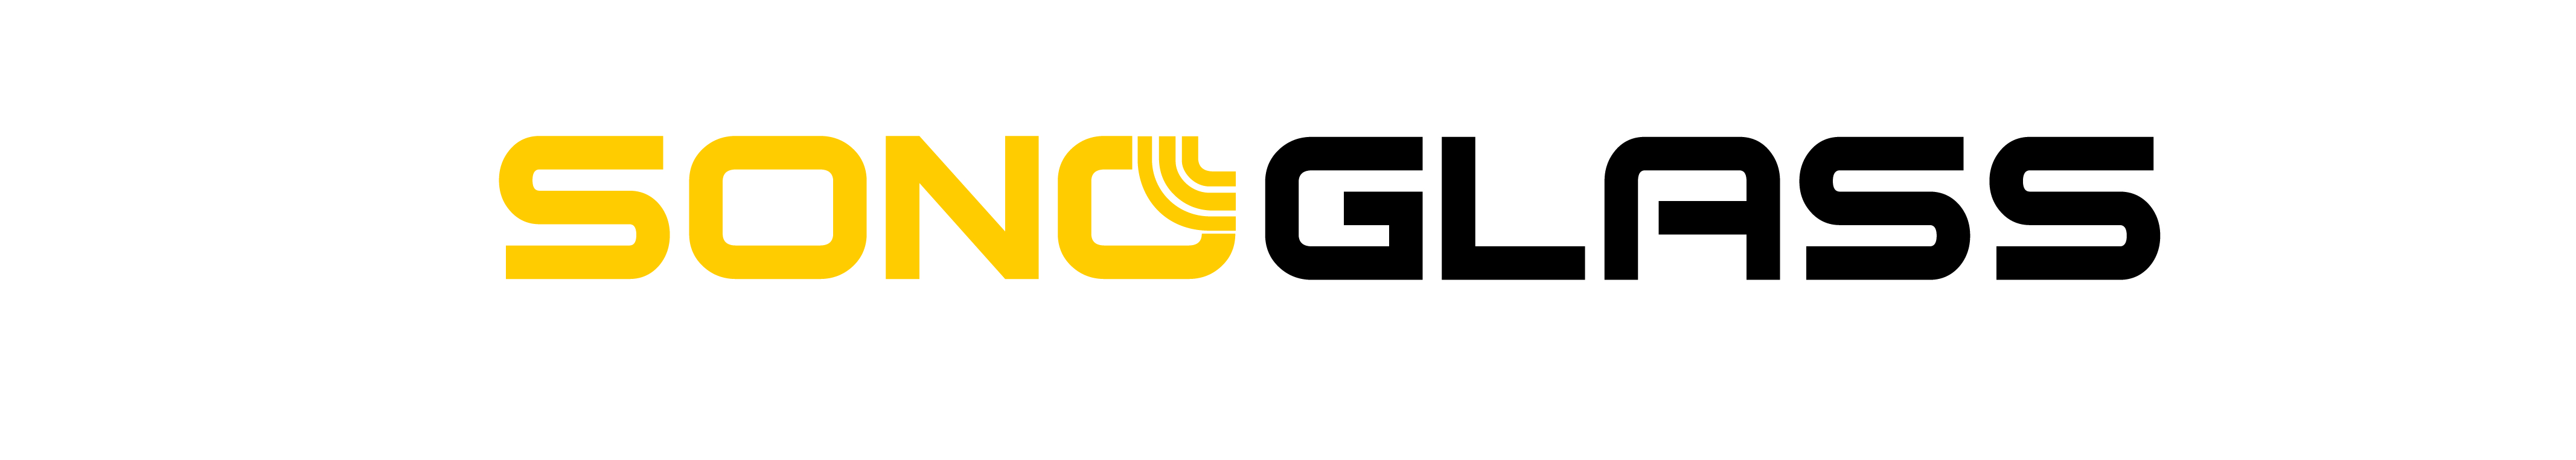 logotipo sonoglass